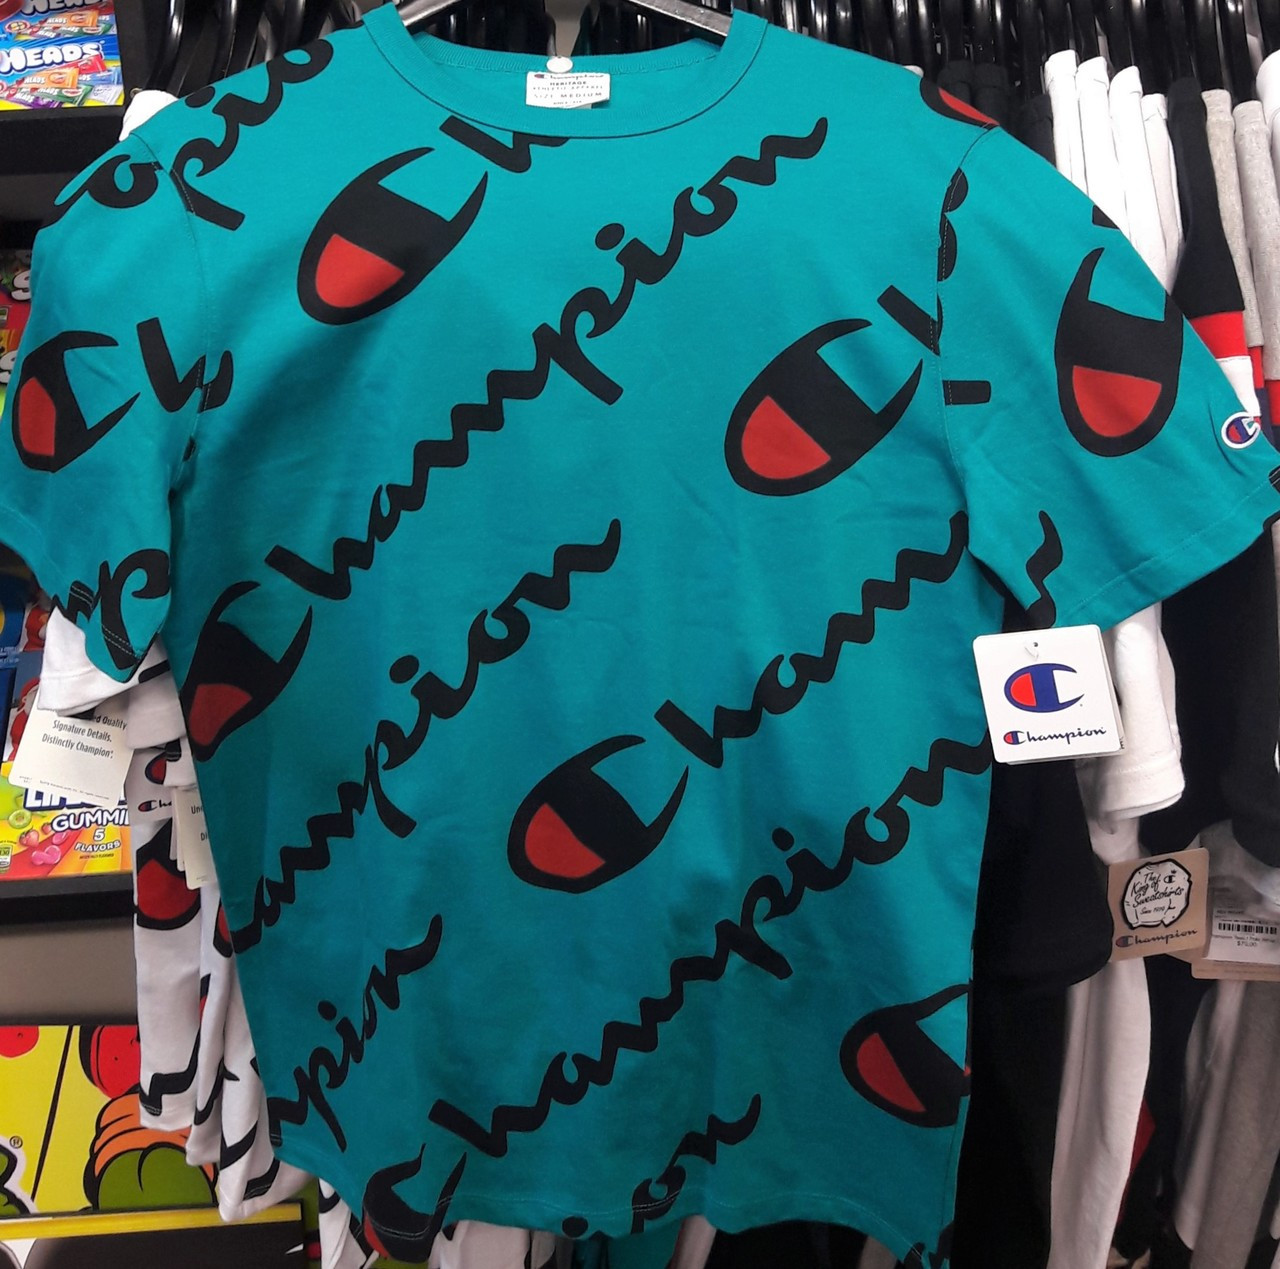 970b5ddc00b Champion Xplode Script Teal T-Shirt - Authentic Champion Clothing ...